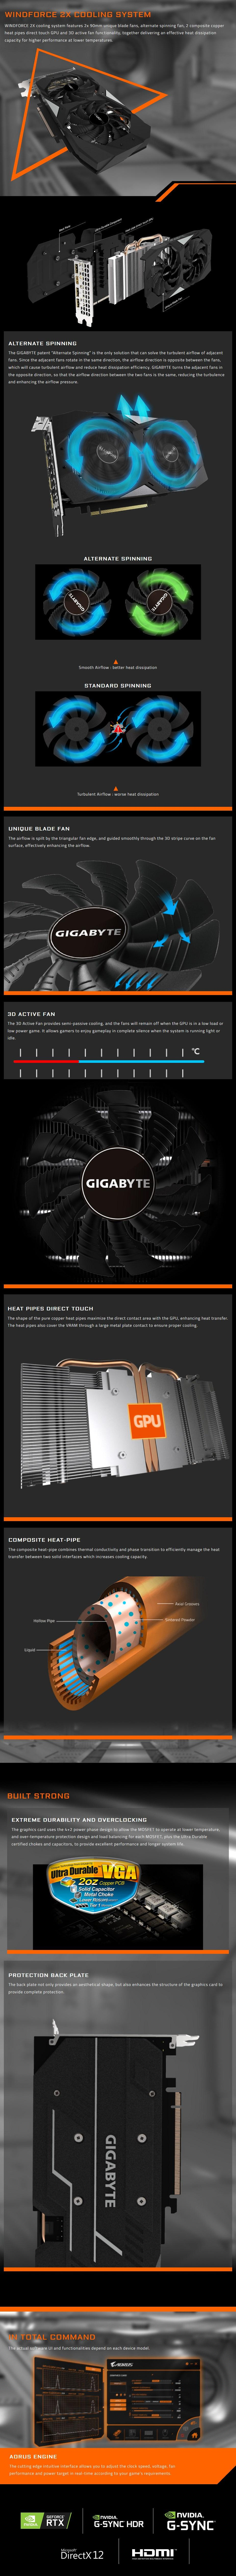 Gigabyte GeForce RTX 2060 OC V2 6GB Video Card - Overview 1